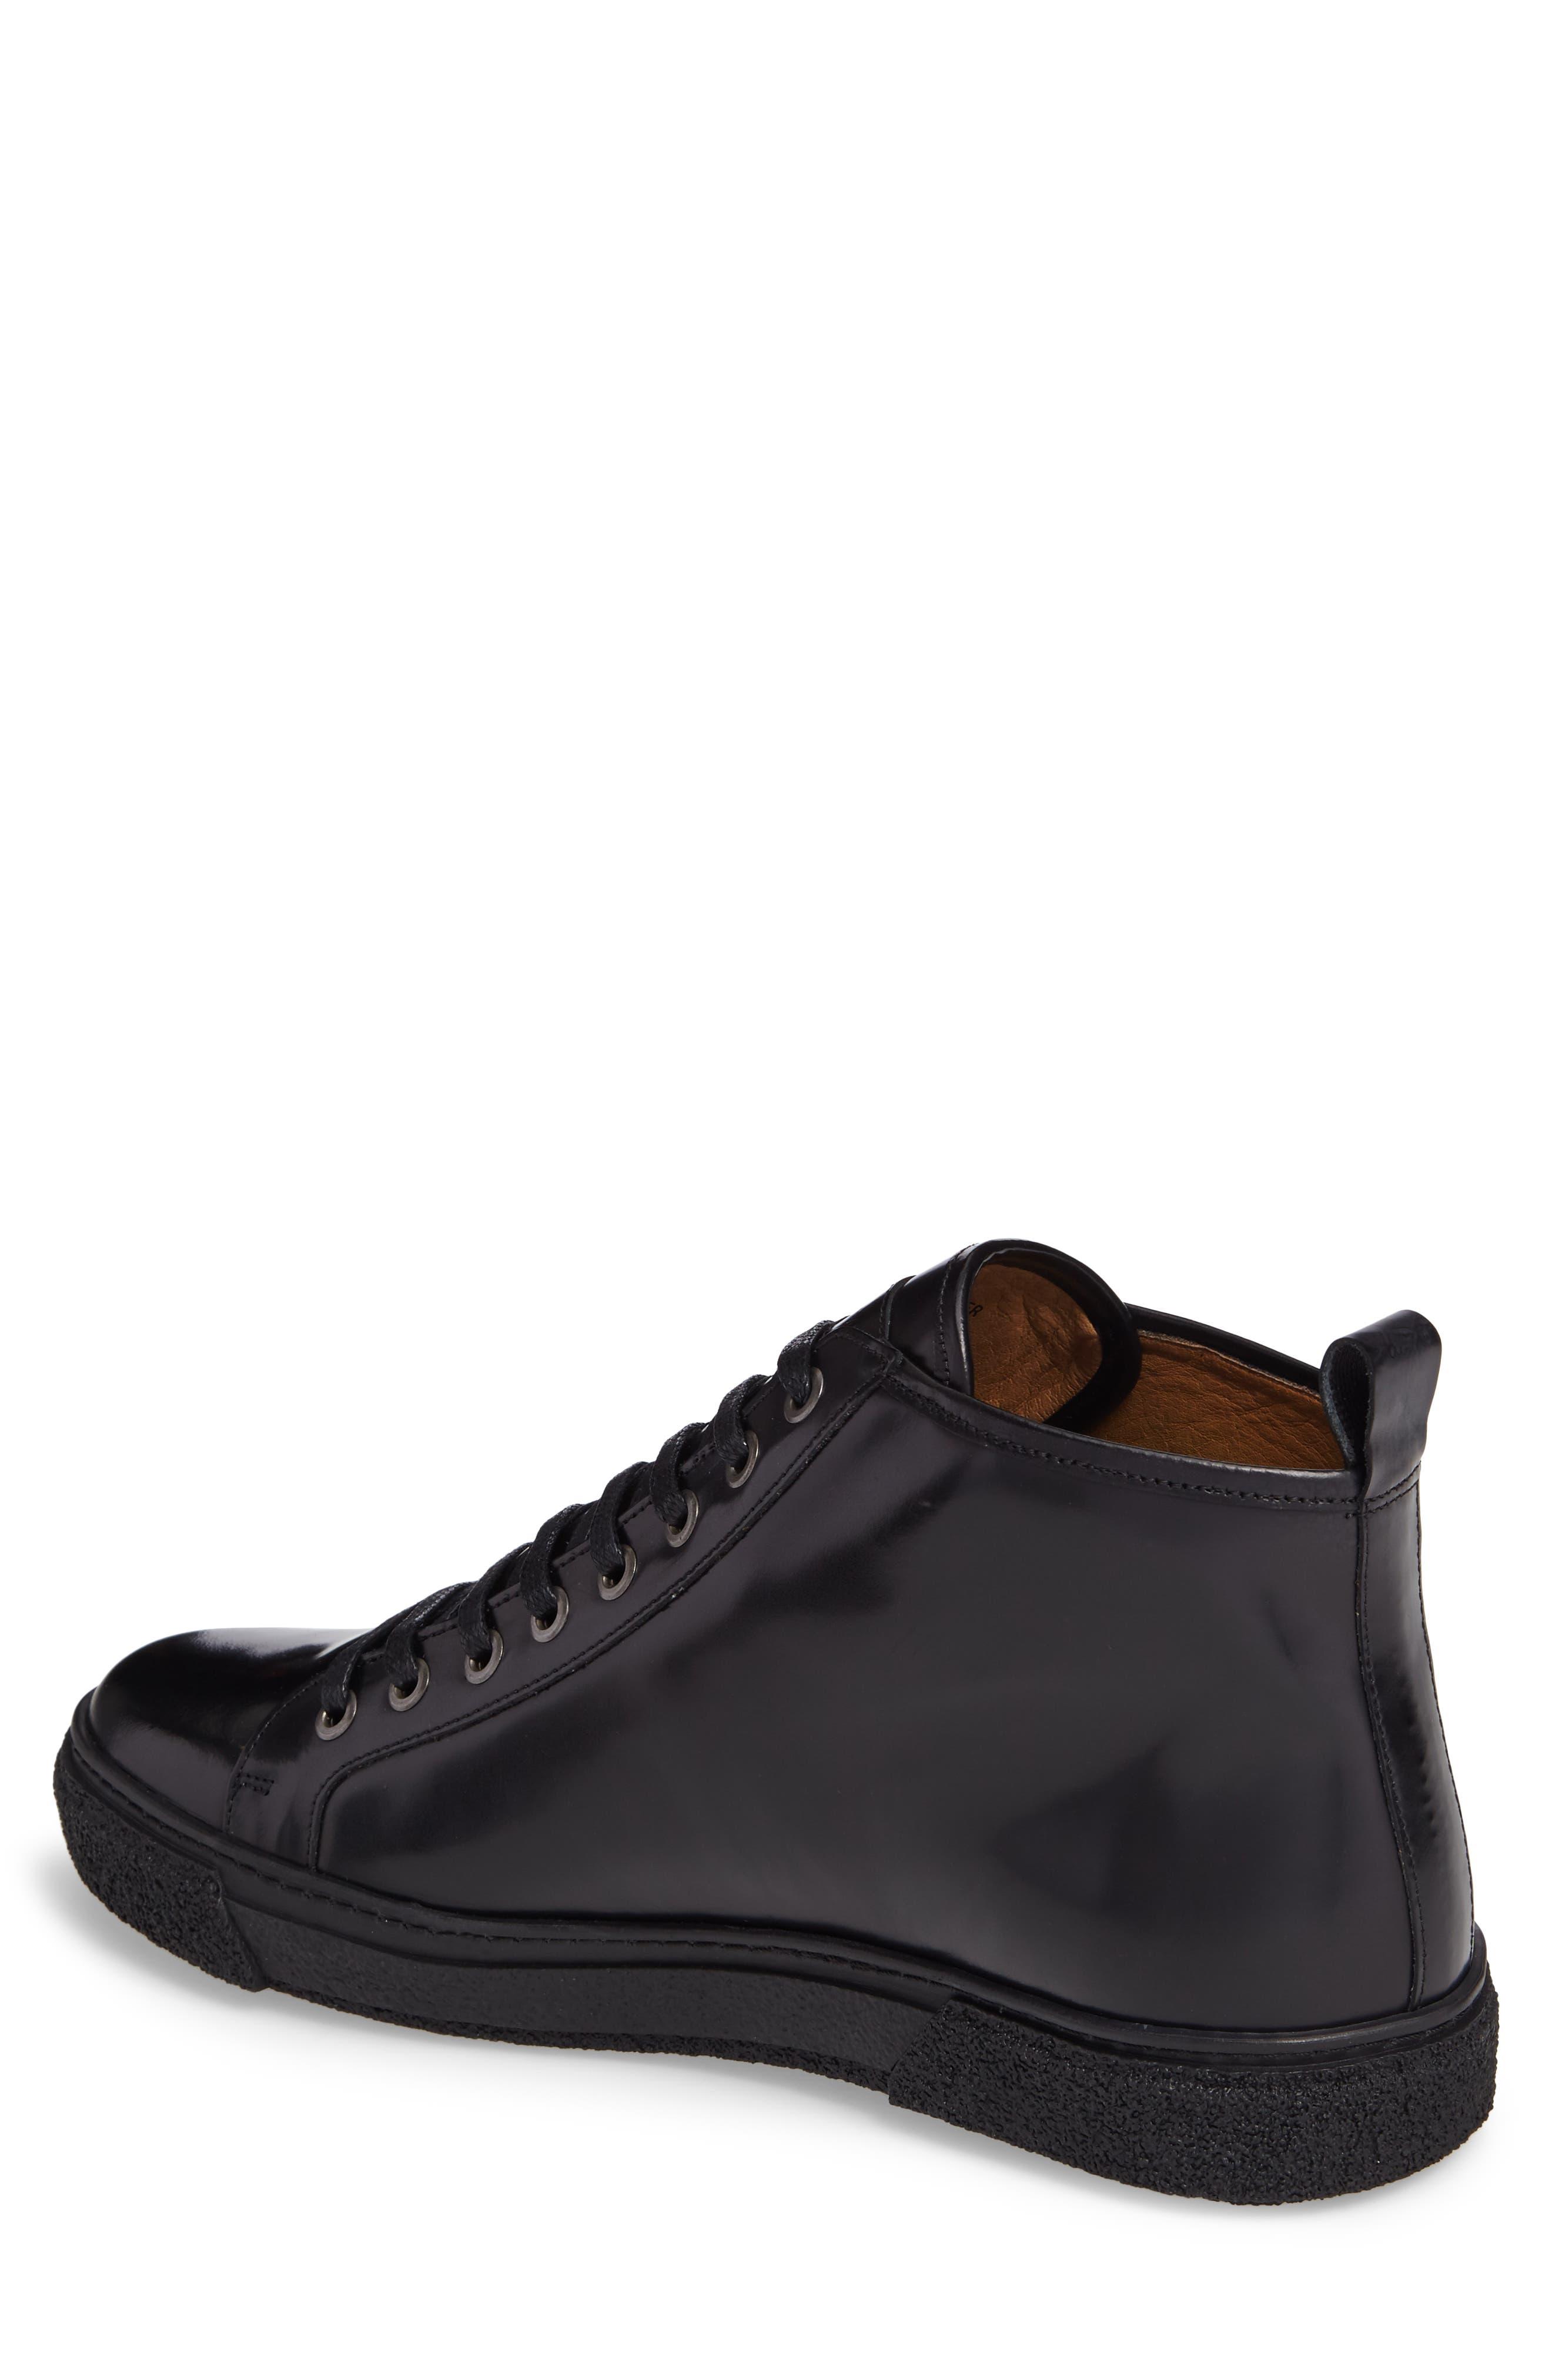 Alternate Image 2  - Vince Camuto Westan Sneaker (Men)